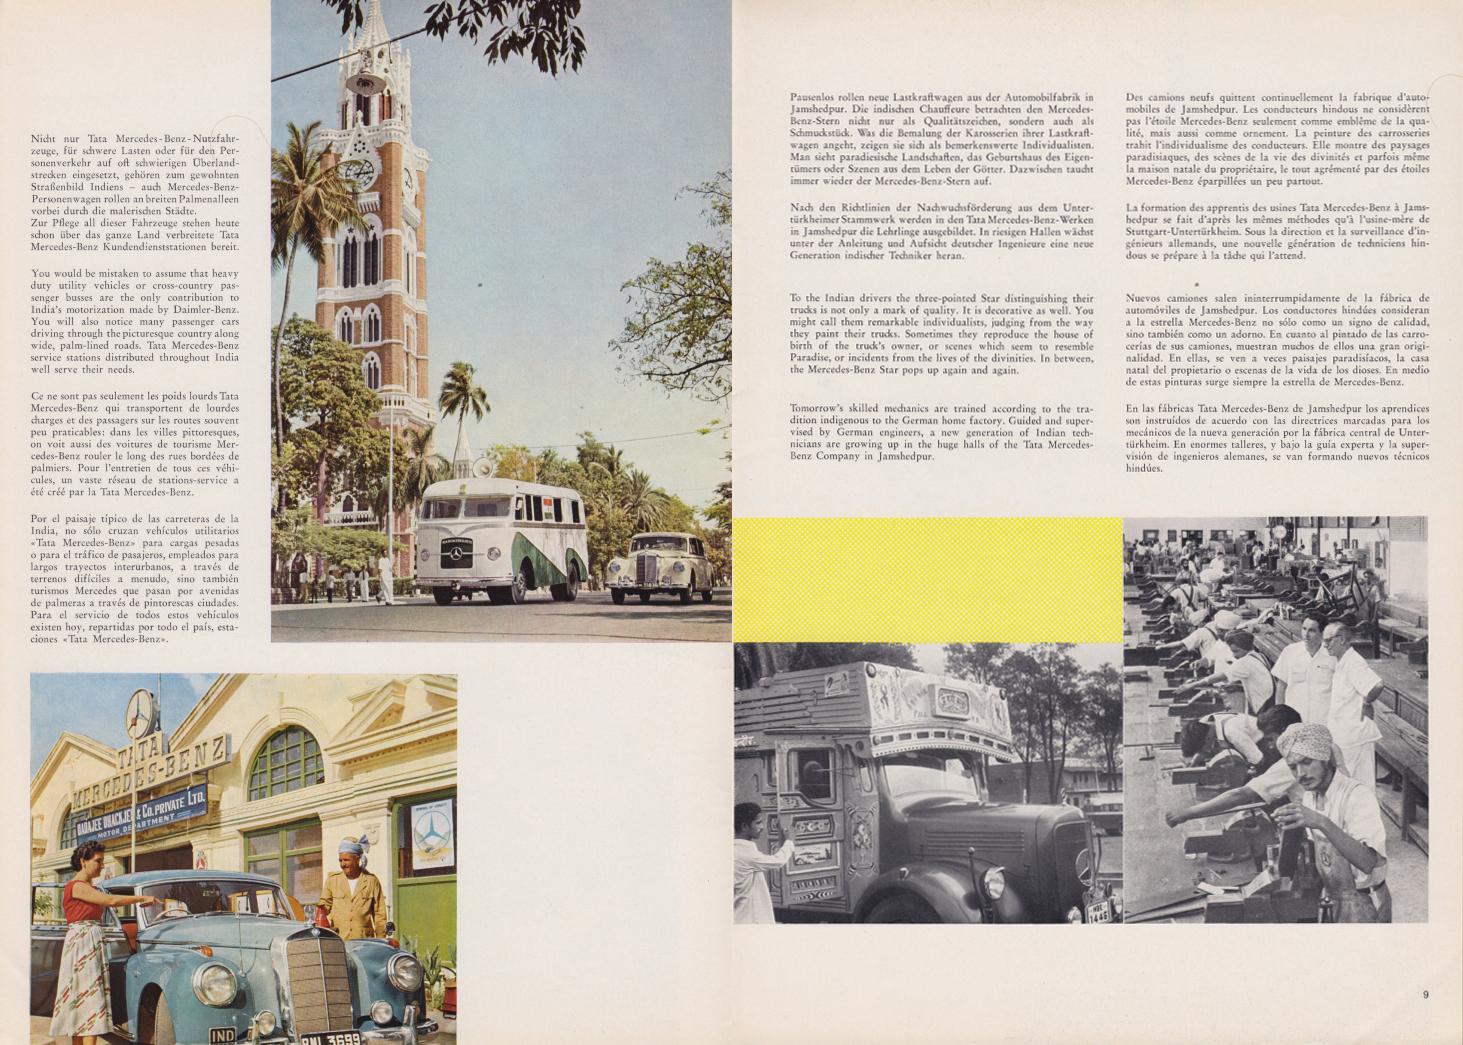 (REVISTA): Periódico In aller welt n.º 30 - Mercedes-Benz no mundo - 1959 - multilingue 005